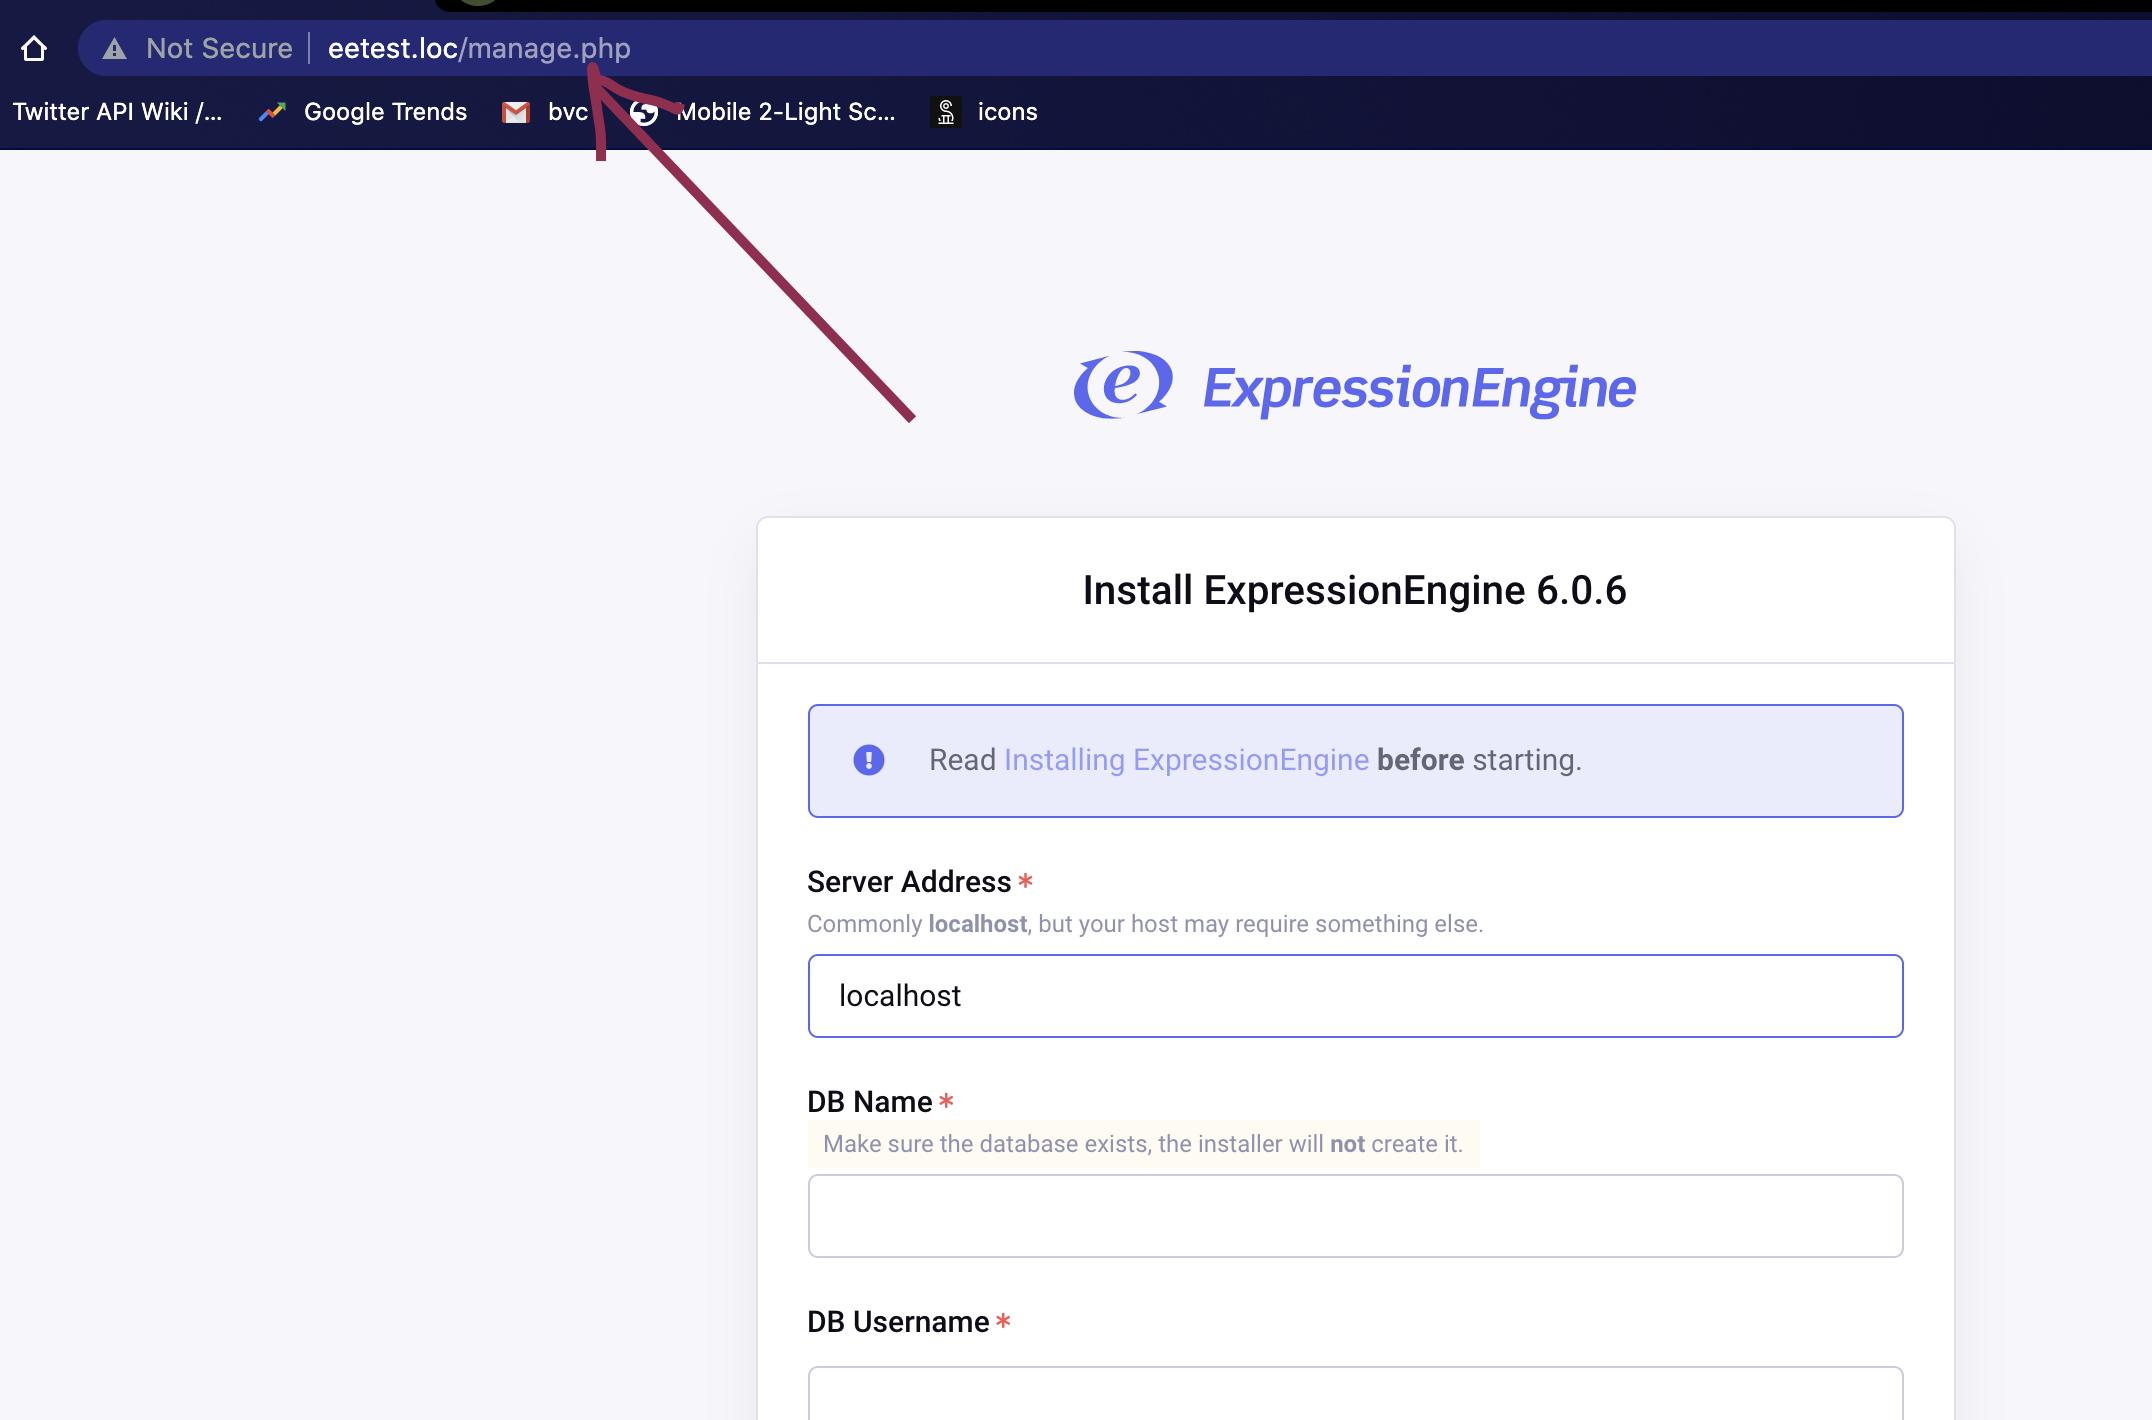 Install ExpressionEngine - database screen at custom address